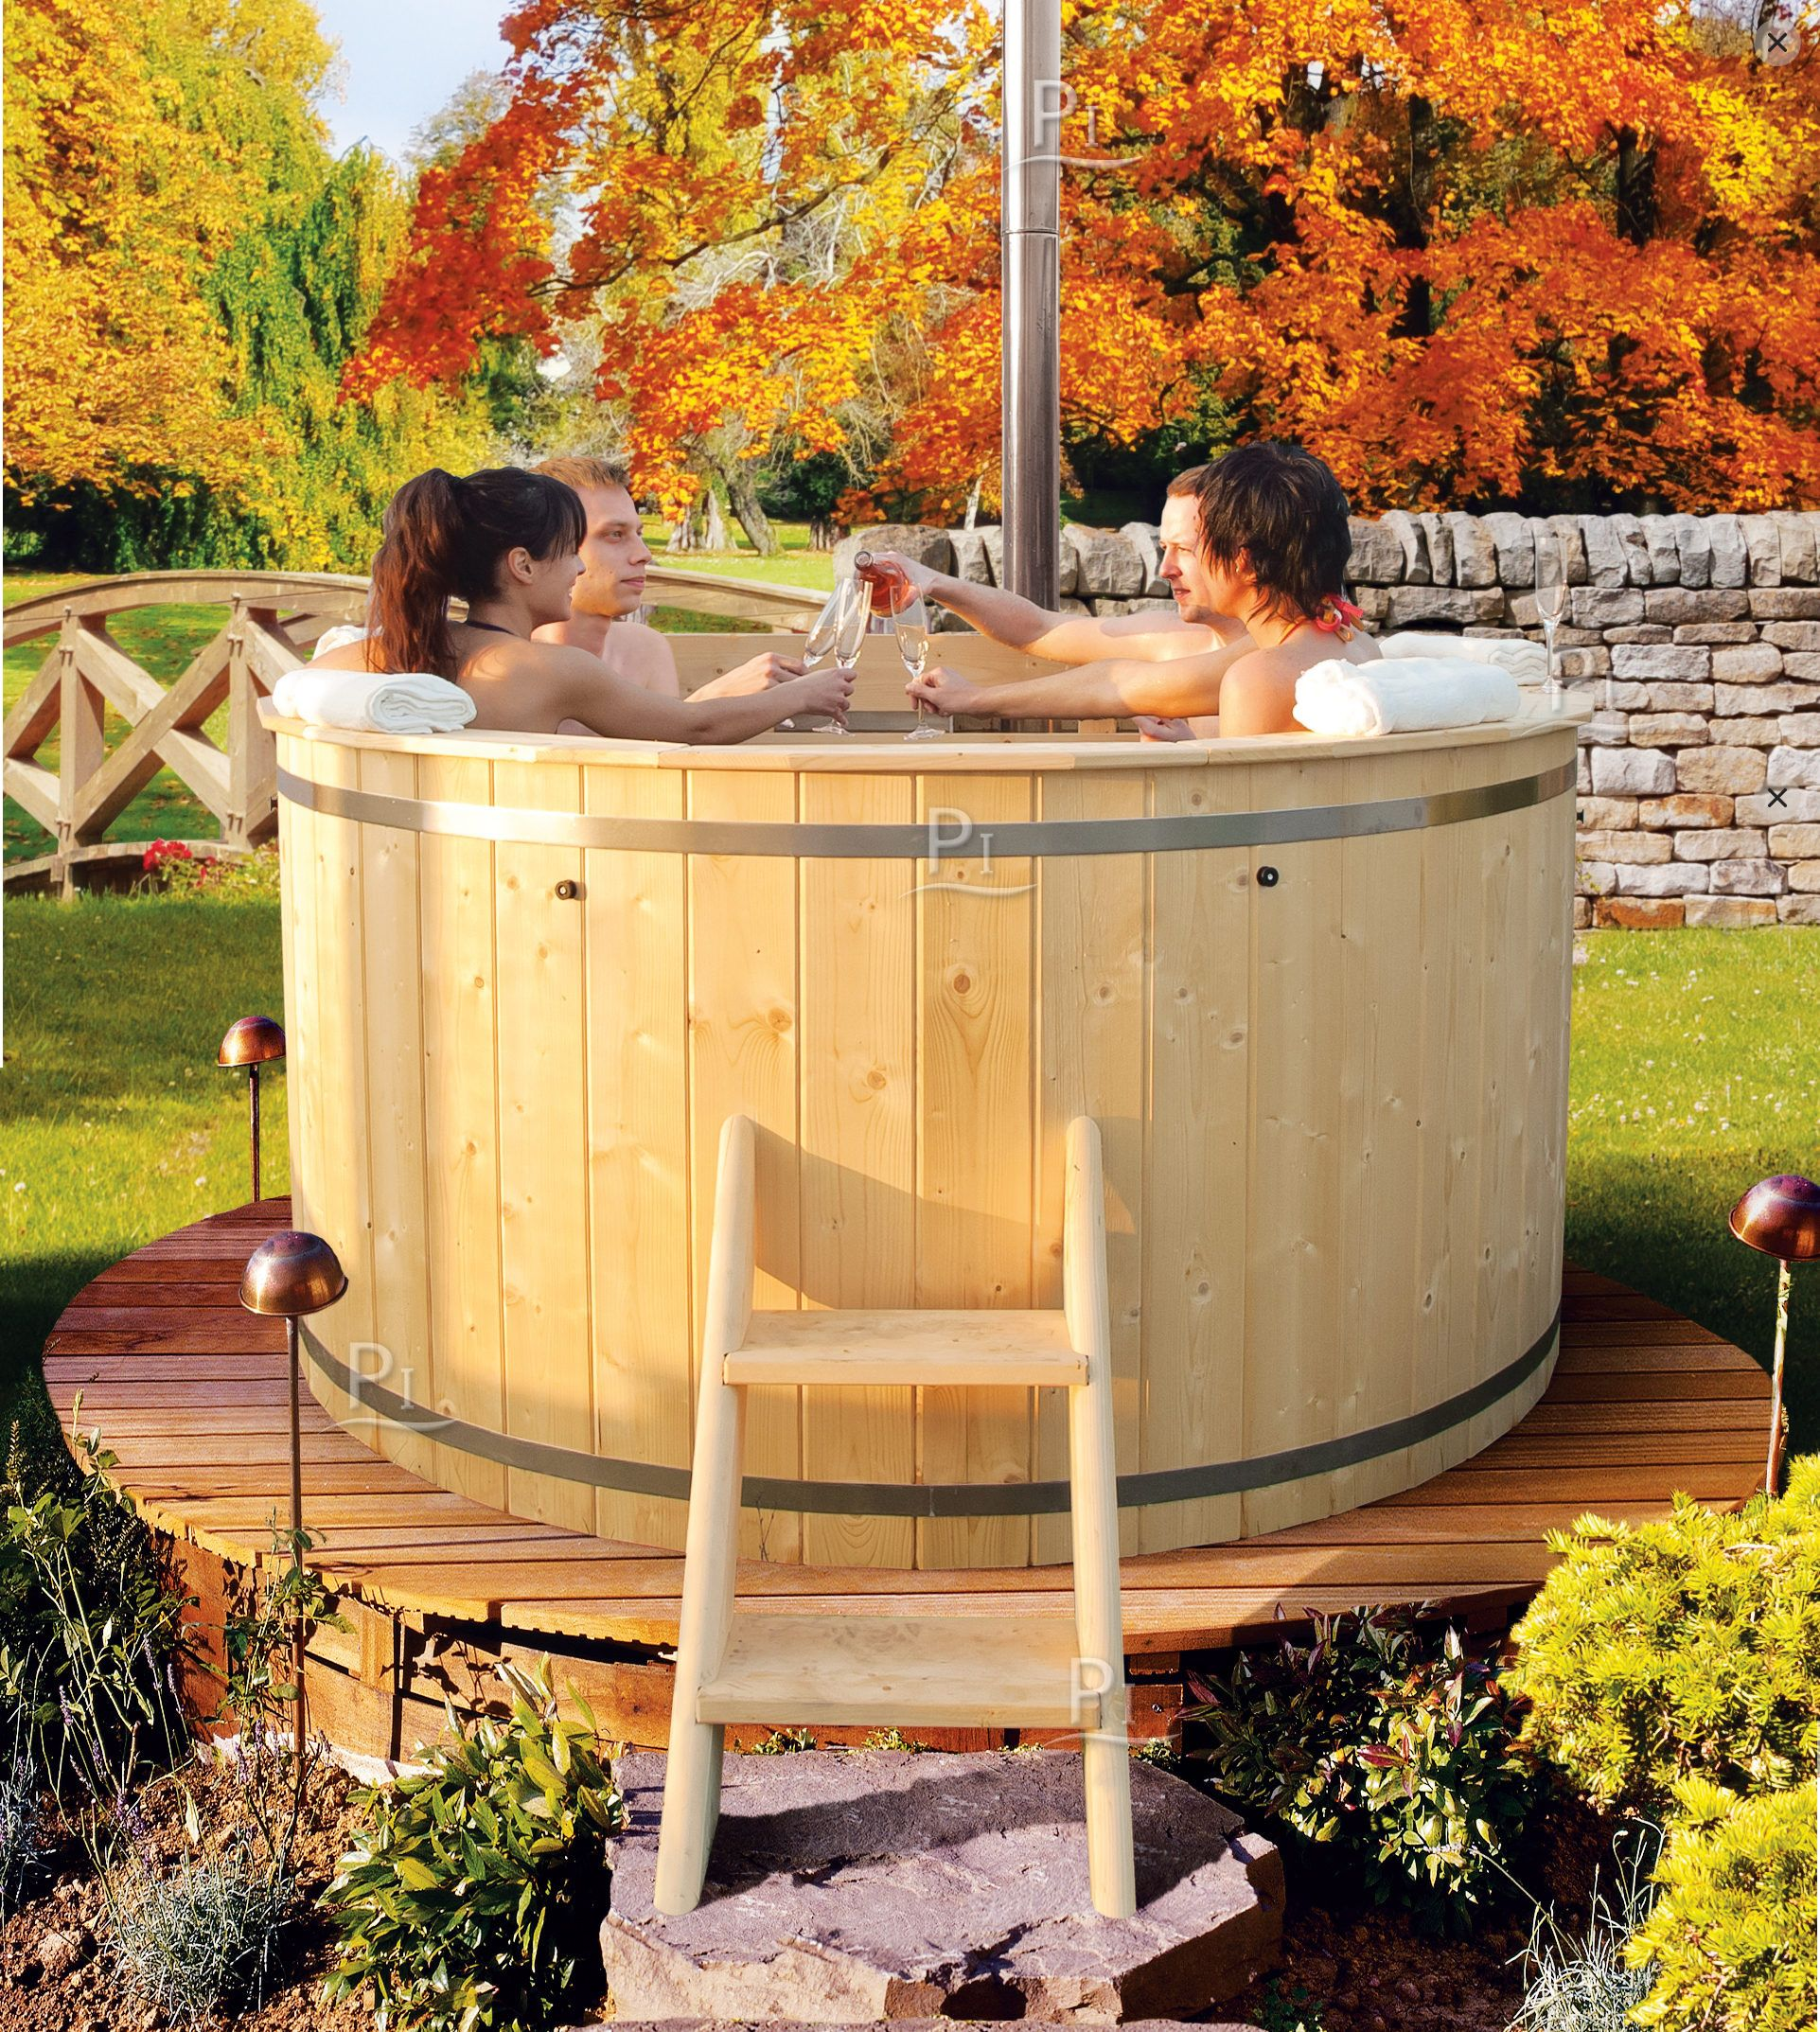 Sauna giardino tinozza vasca da bagno a botte spa nel 2019 pinterest tub spa e home - Tinozza da bagno ...